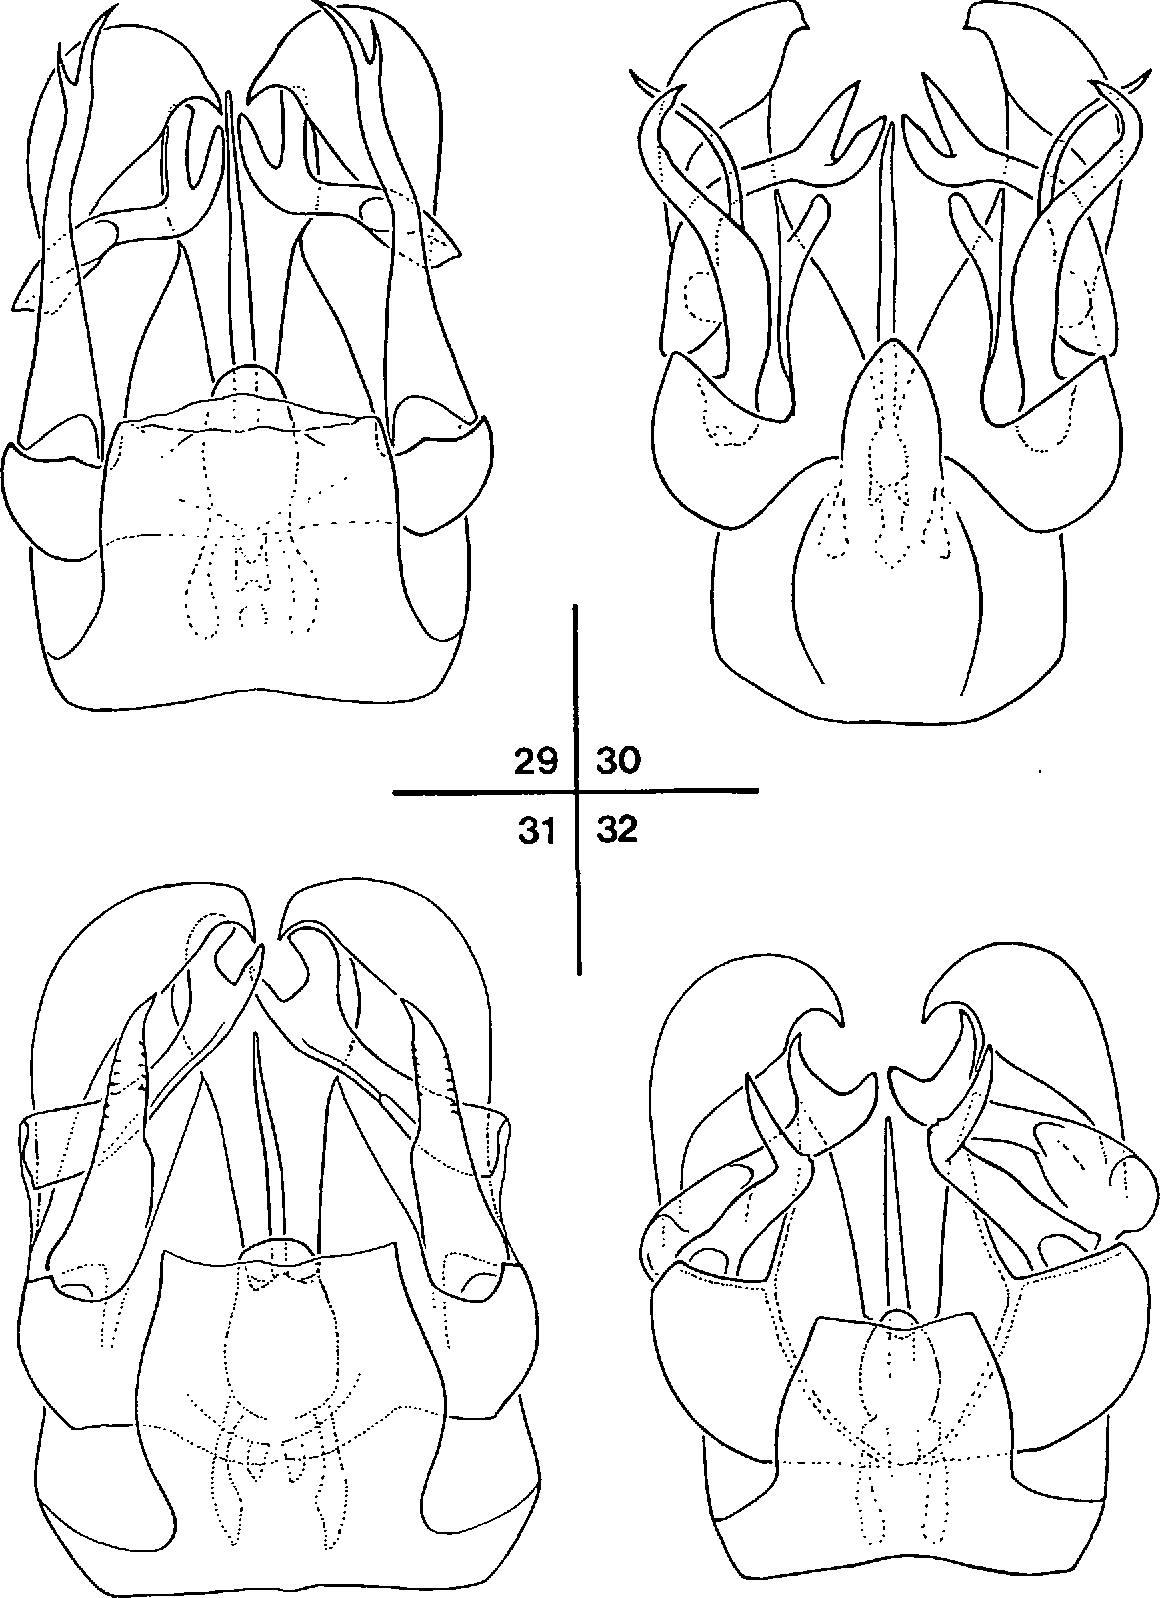 figure 29-32